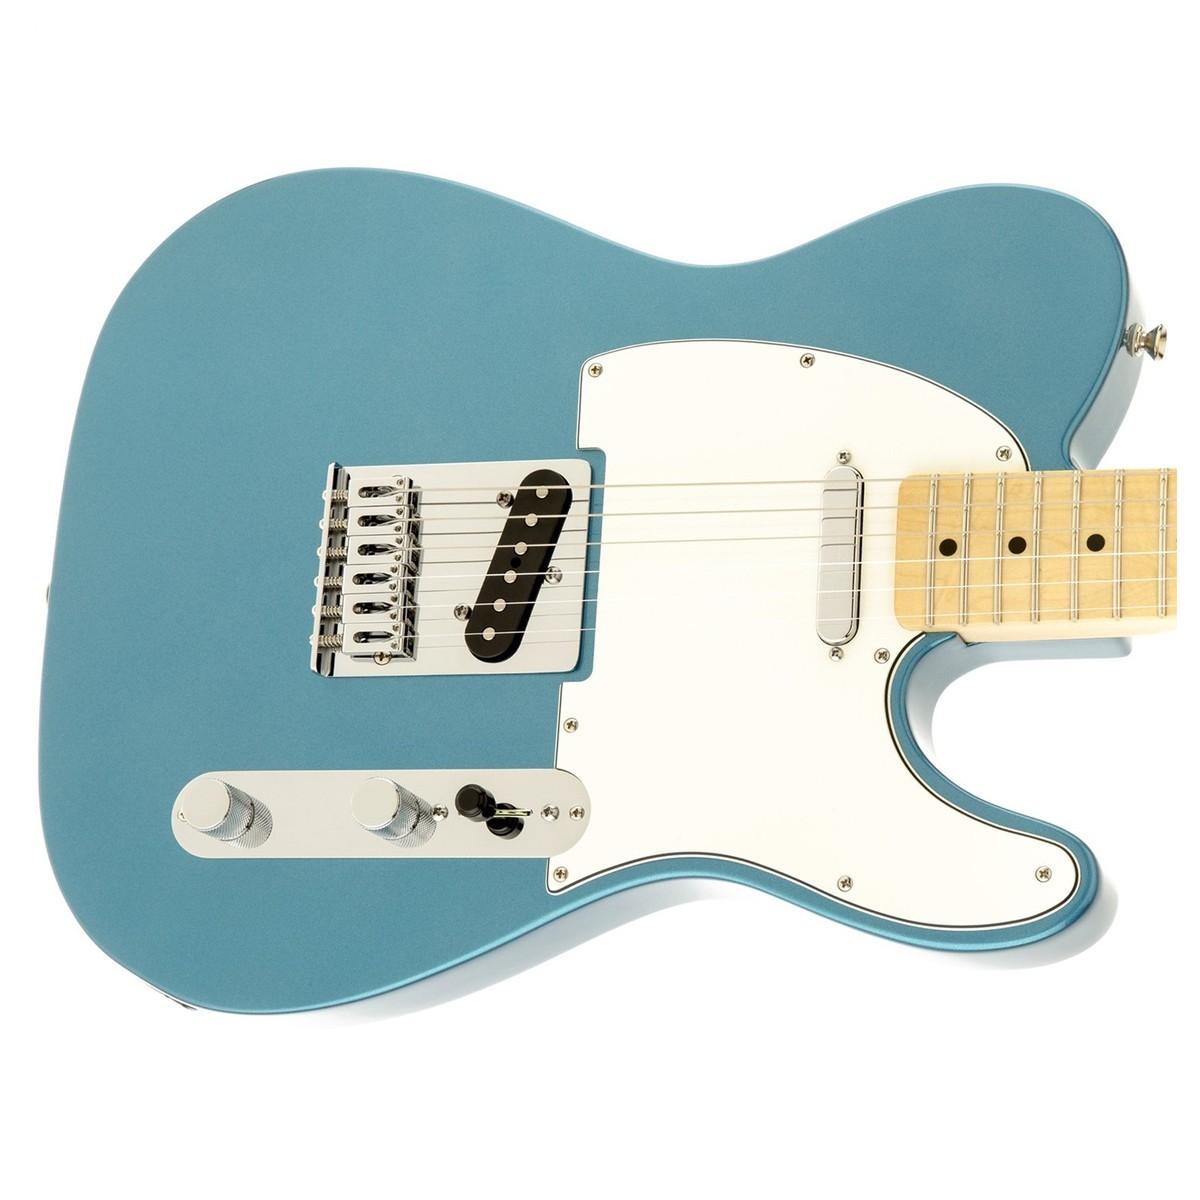 Fender standard telecaster mn lake placid blue at gear4music fender standard telecaster mn blue loading zoom publicscrutiny Image collections